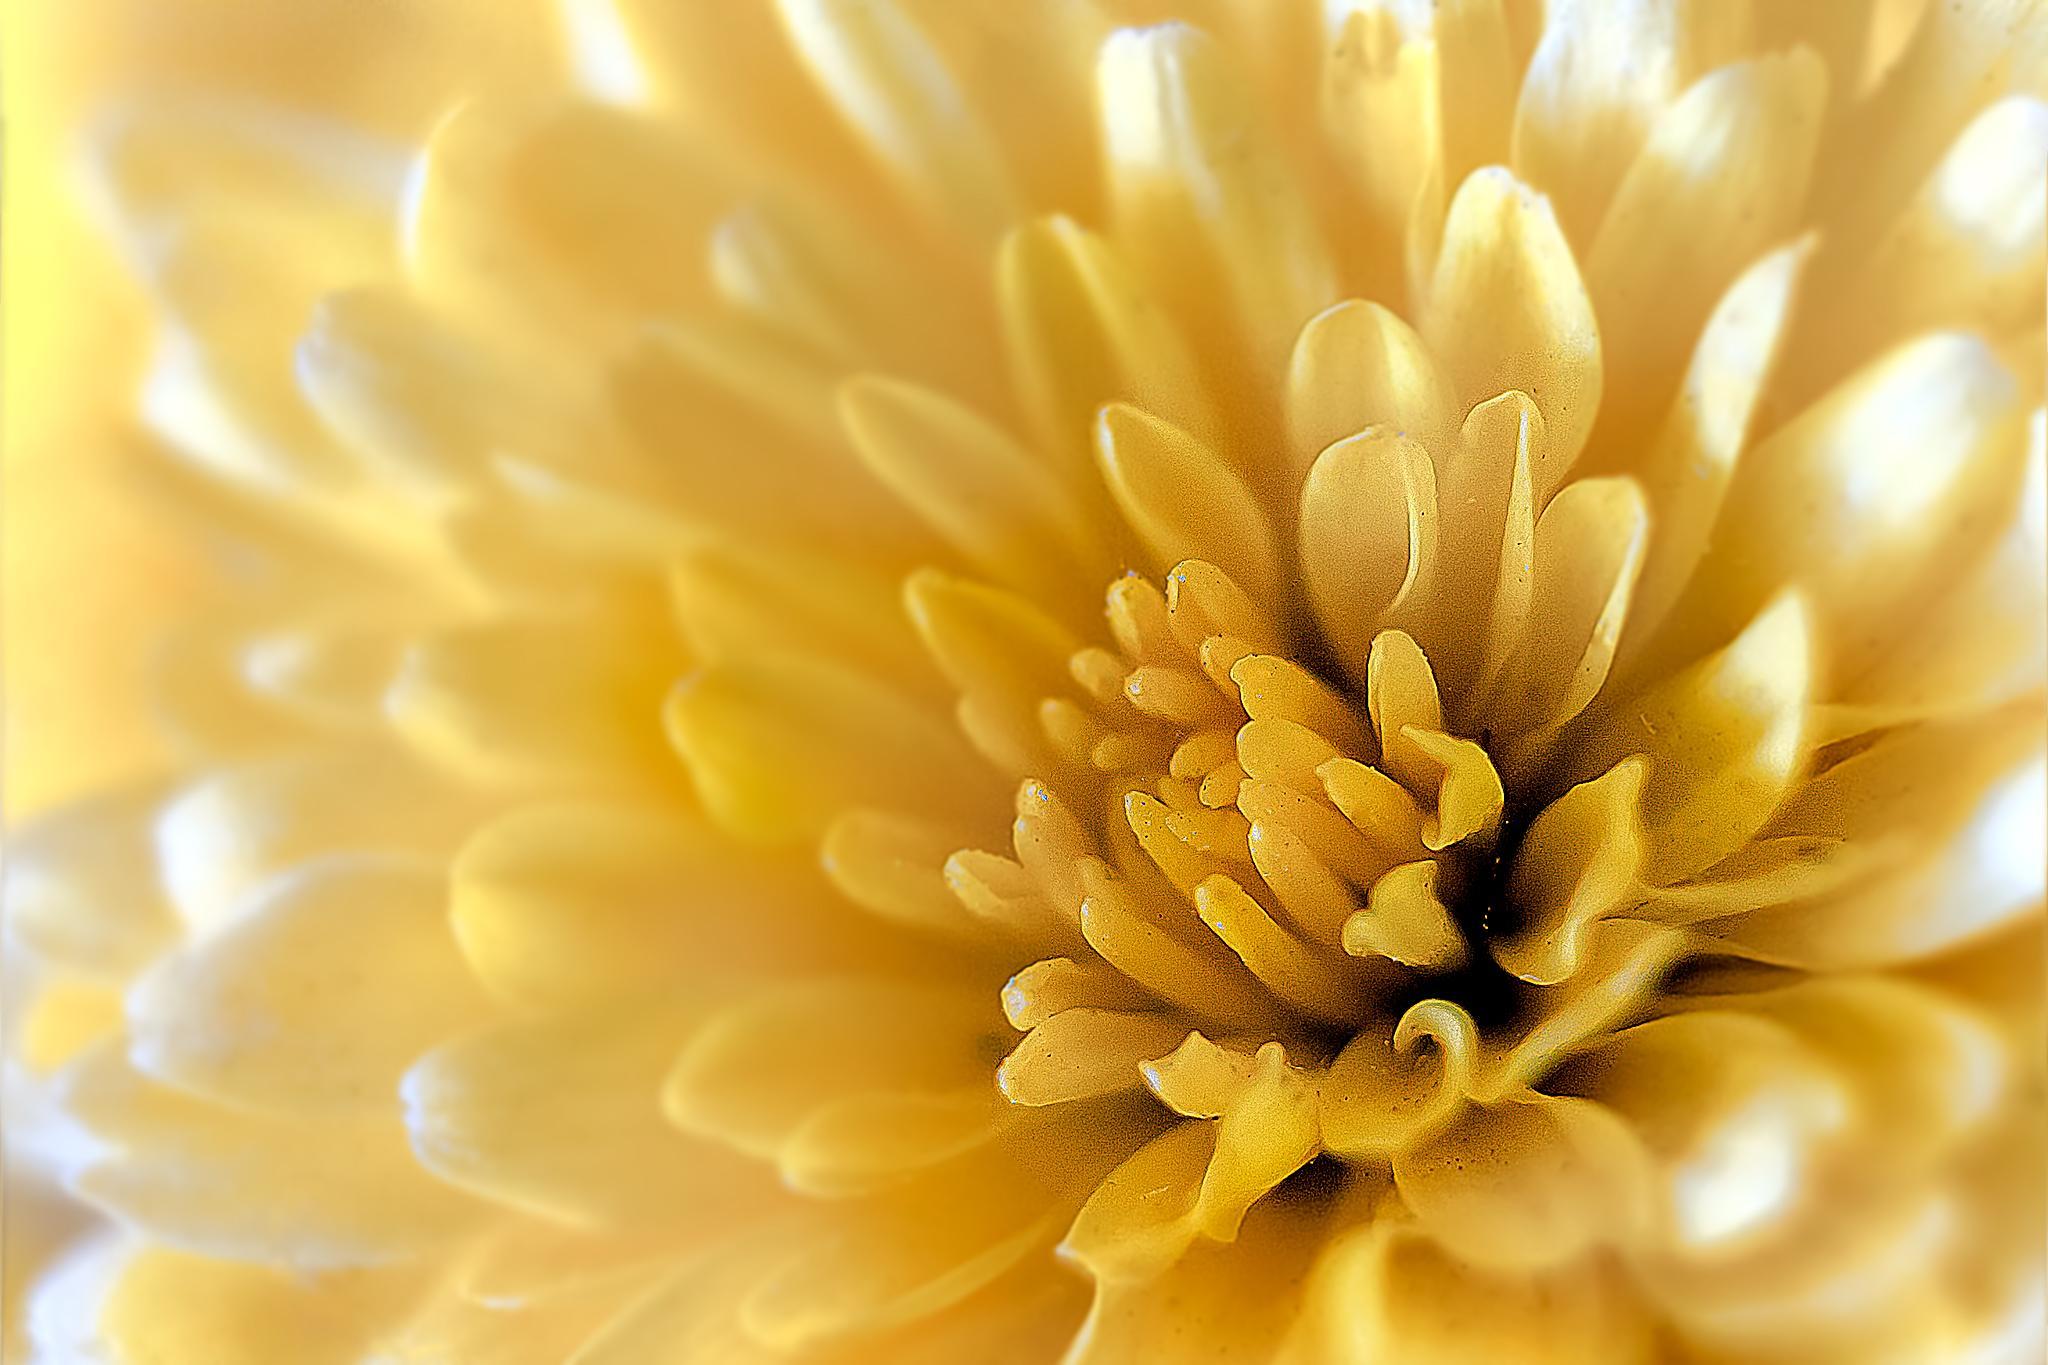 Chrysanthemum 3 by Tony Guzman